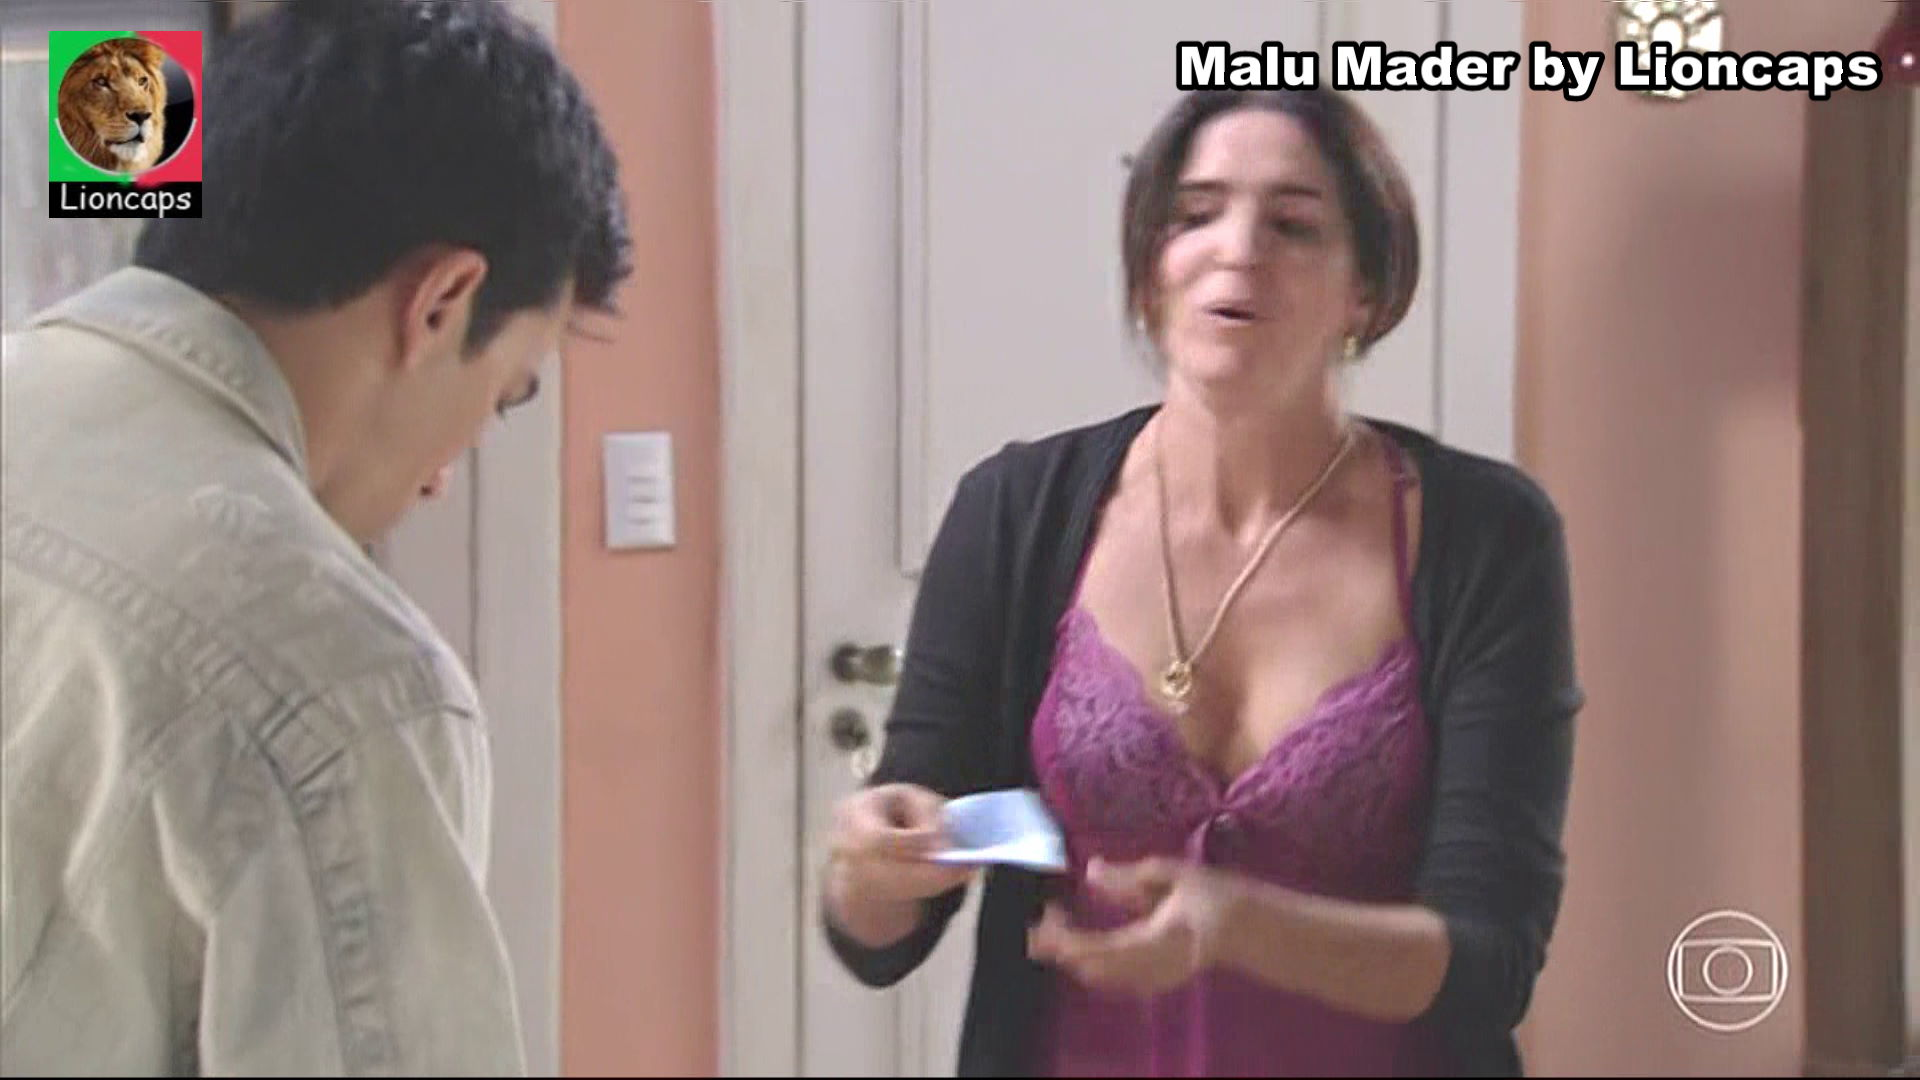 657305823_malu_mader_vs181201_0114_122_87lo.JPG